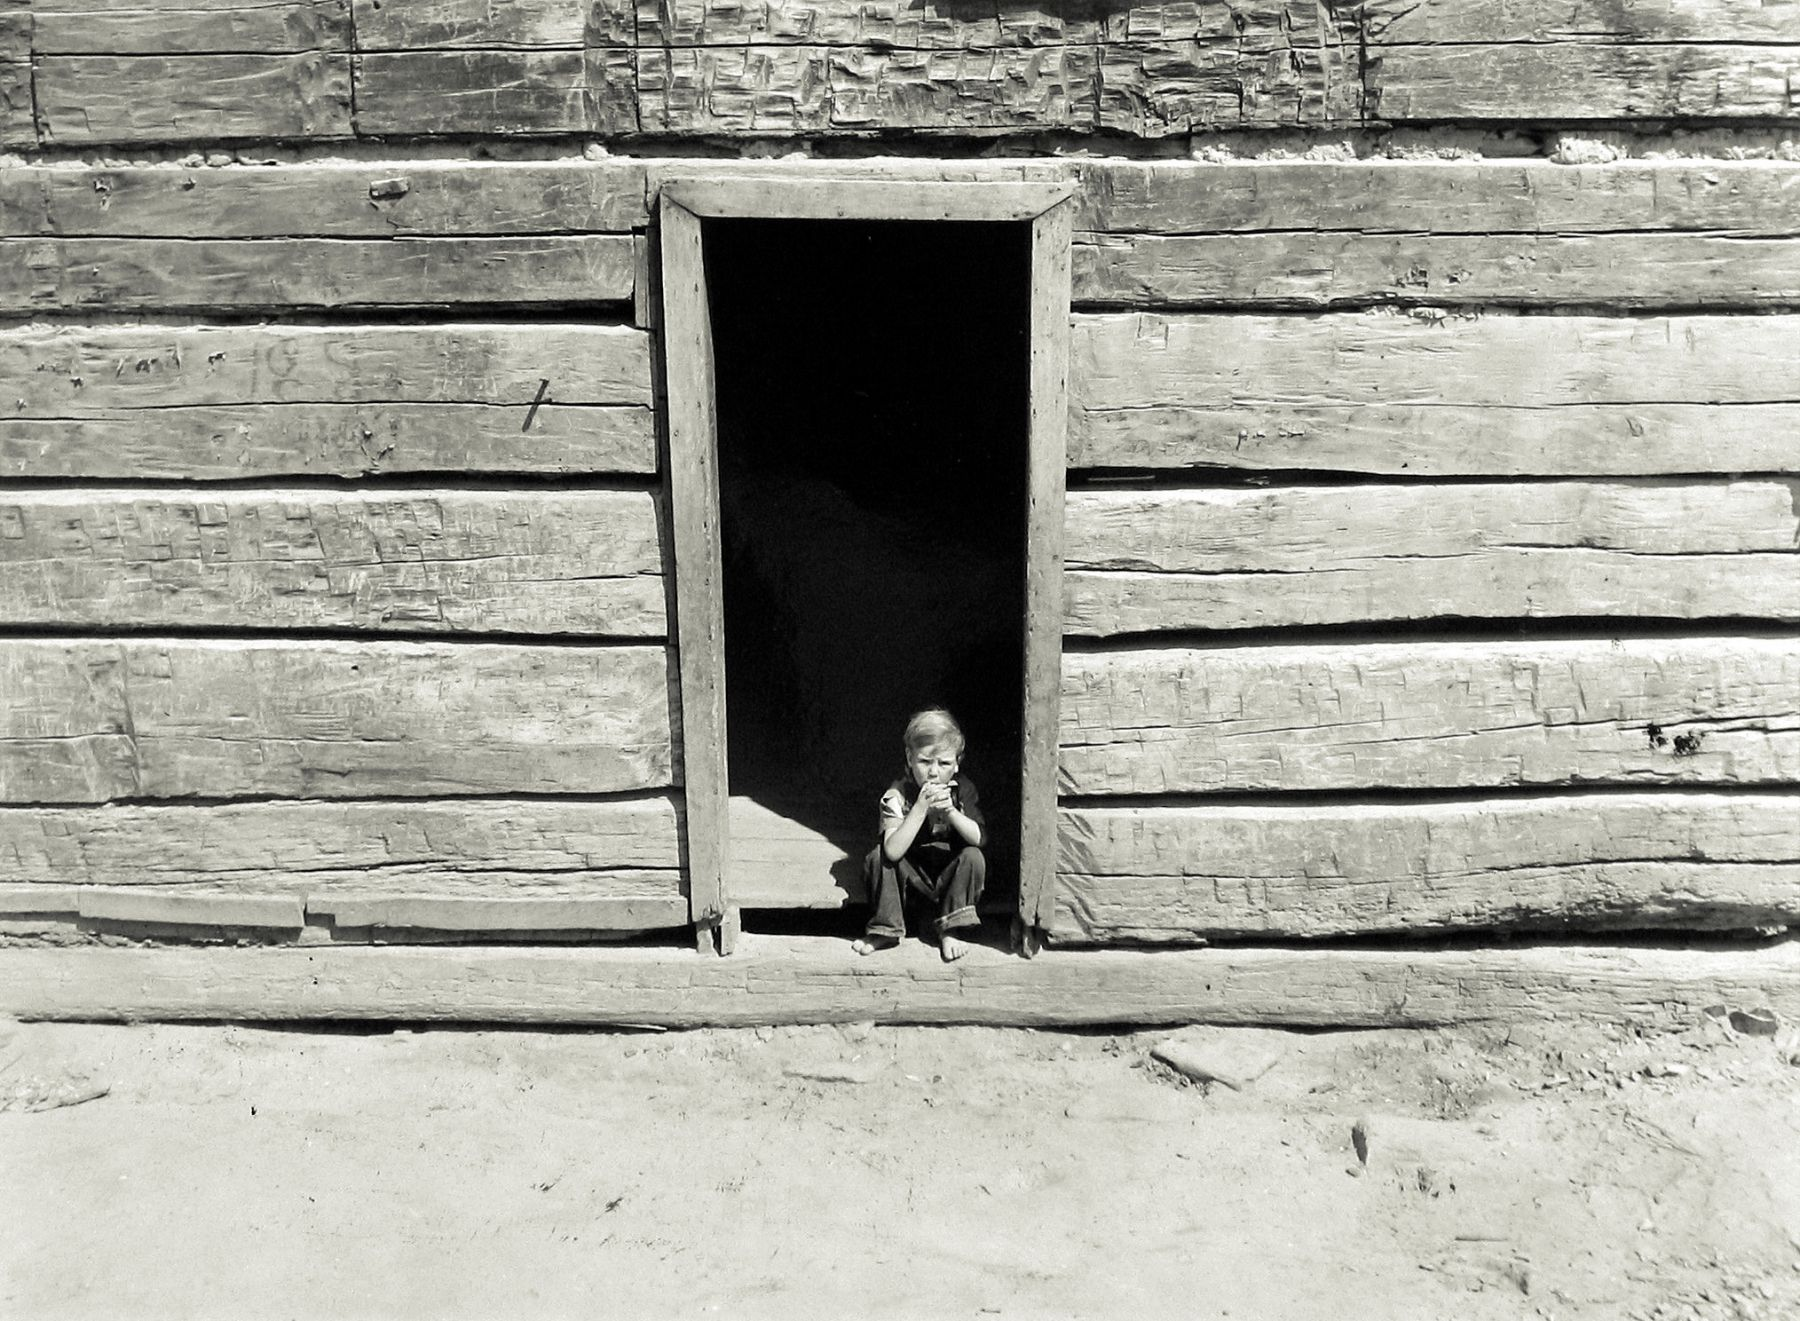 Marion Post-Wolcott - Old Mountain Cabin Made of Hand Hewn Logs, near Jackson, Breathitt County, Kentucky, September 1940 - Howard Greenberg Gallery